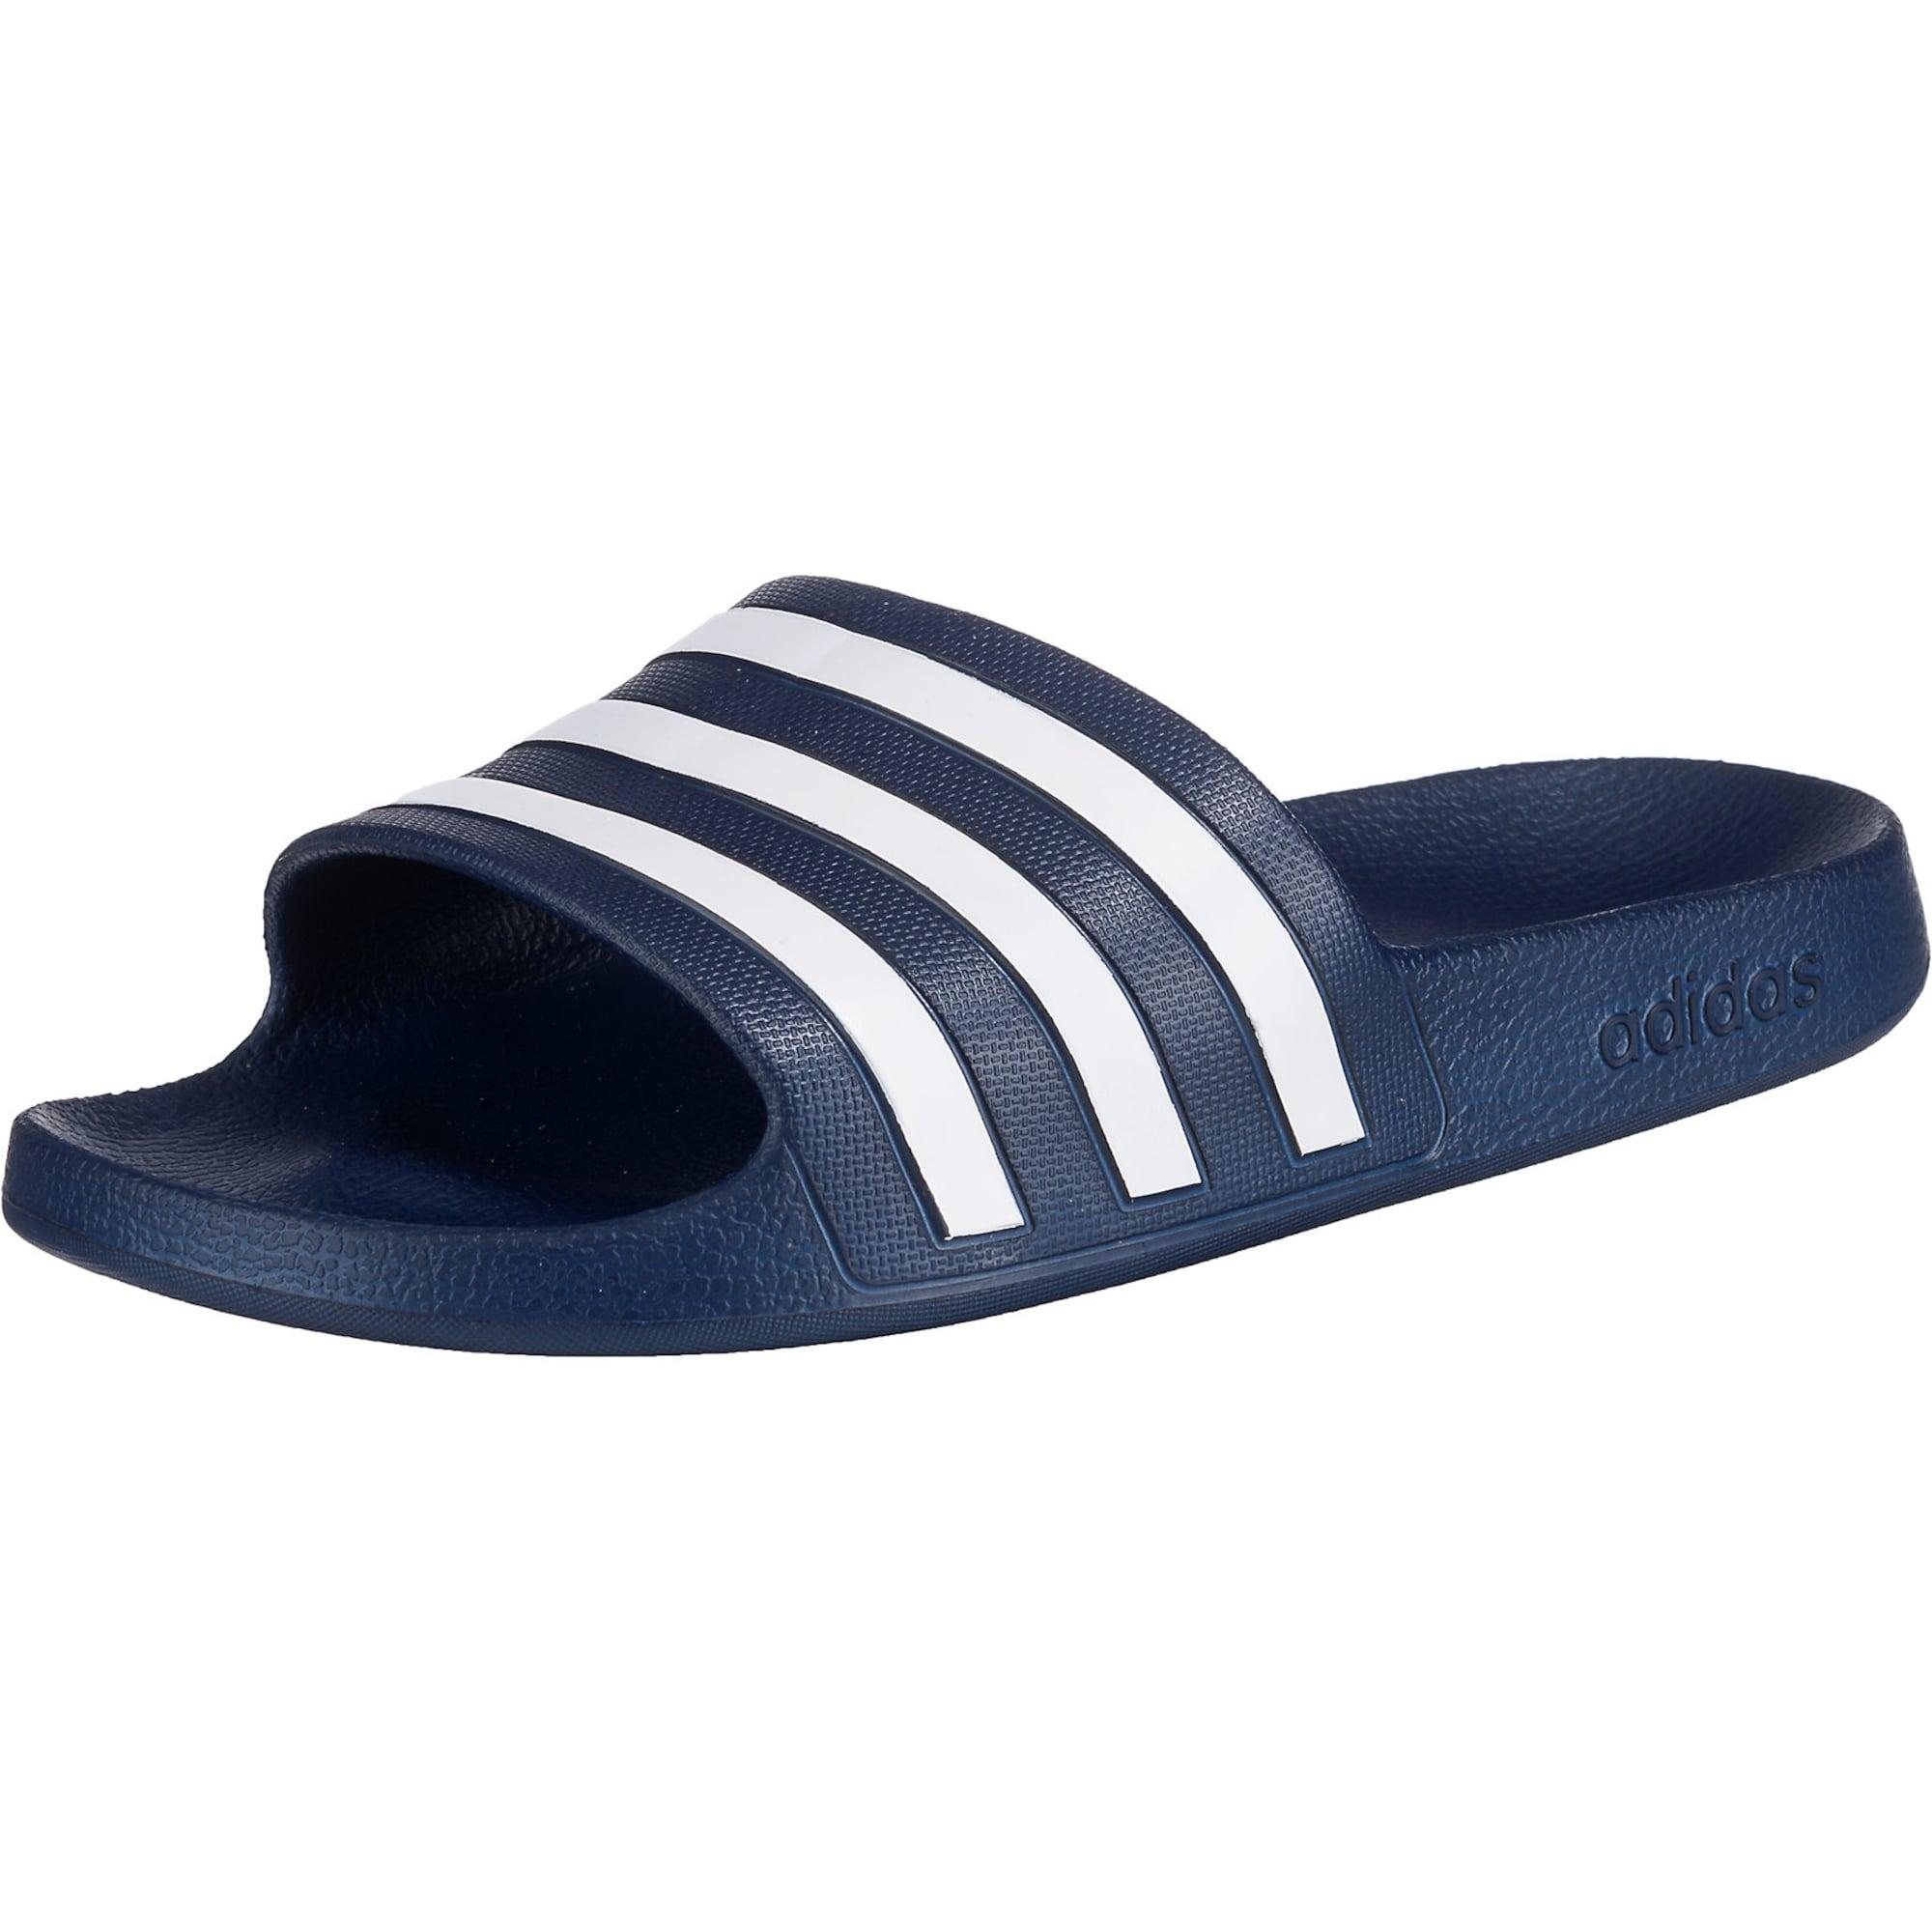 Plážovákoupací obuv Adilette Aqua tmavě modrá bílá ADIDAS PERFORMANCE